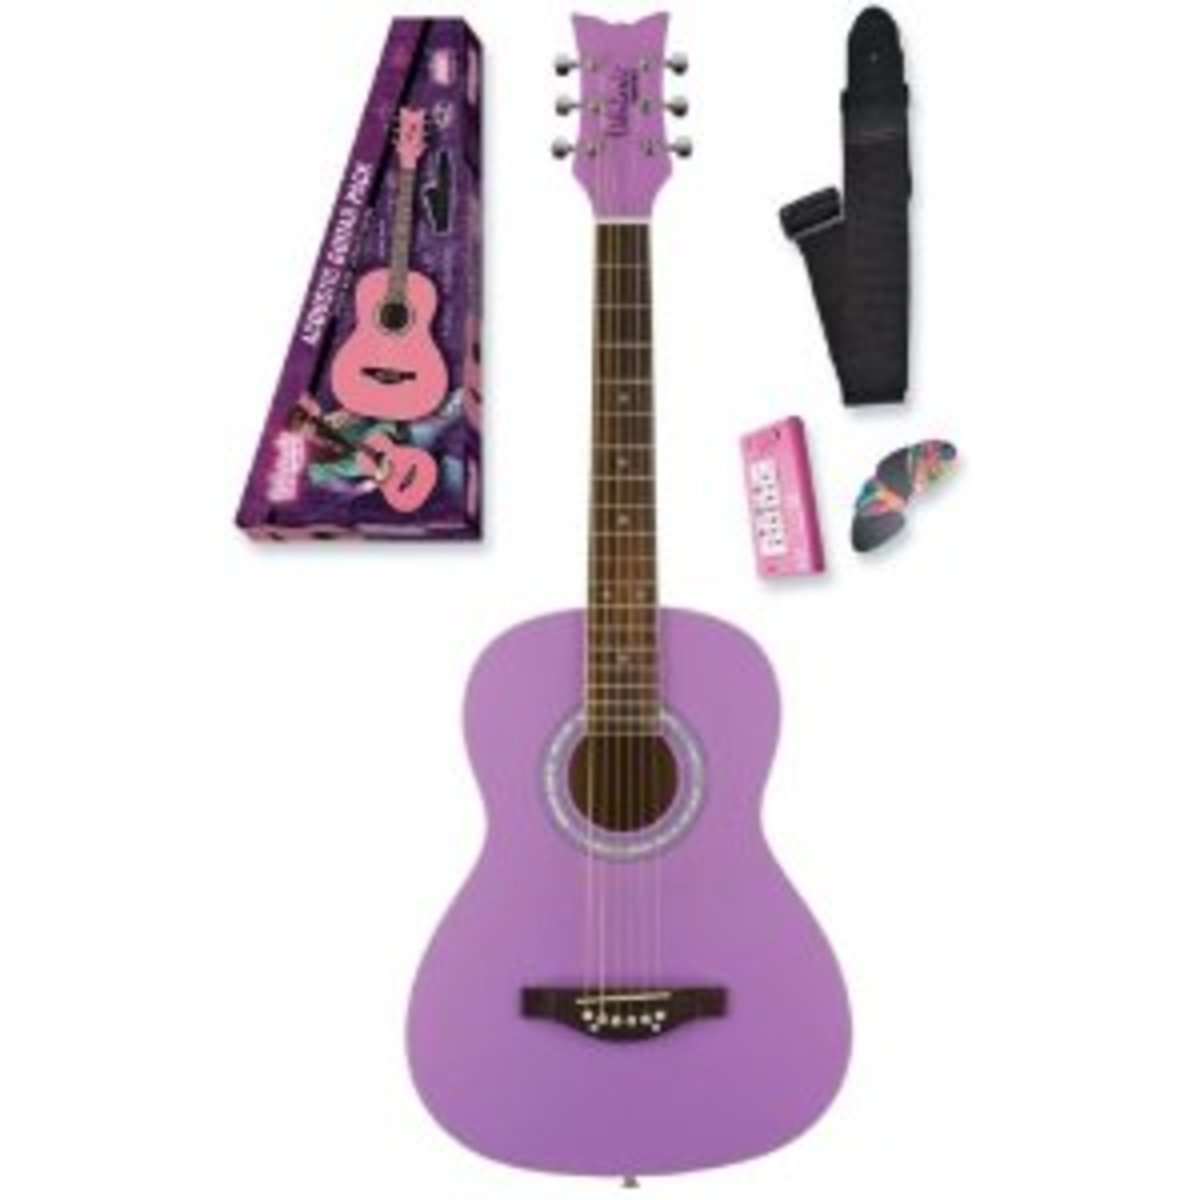 daisy-rock-pink-guitars-for-girls